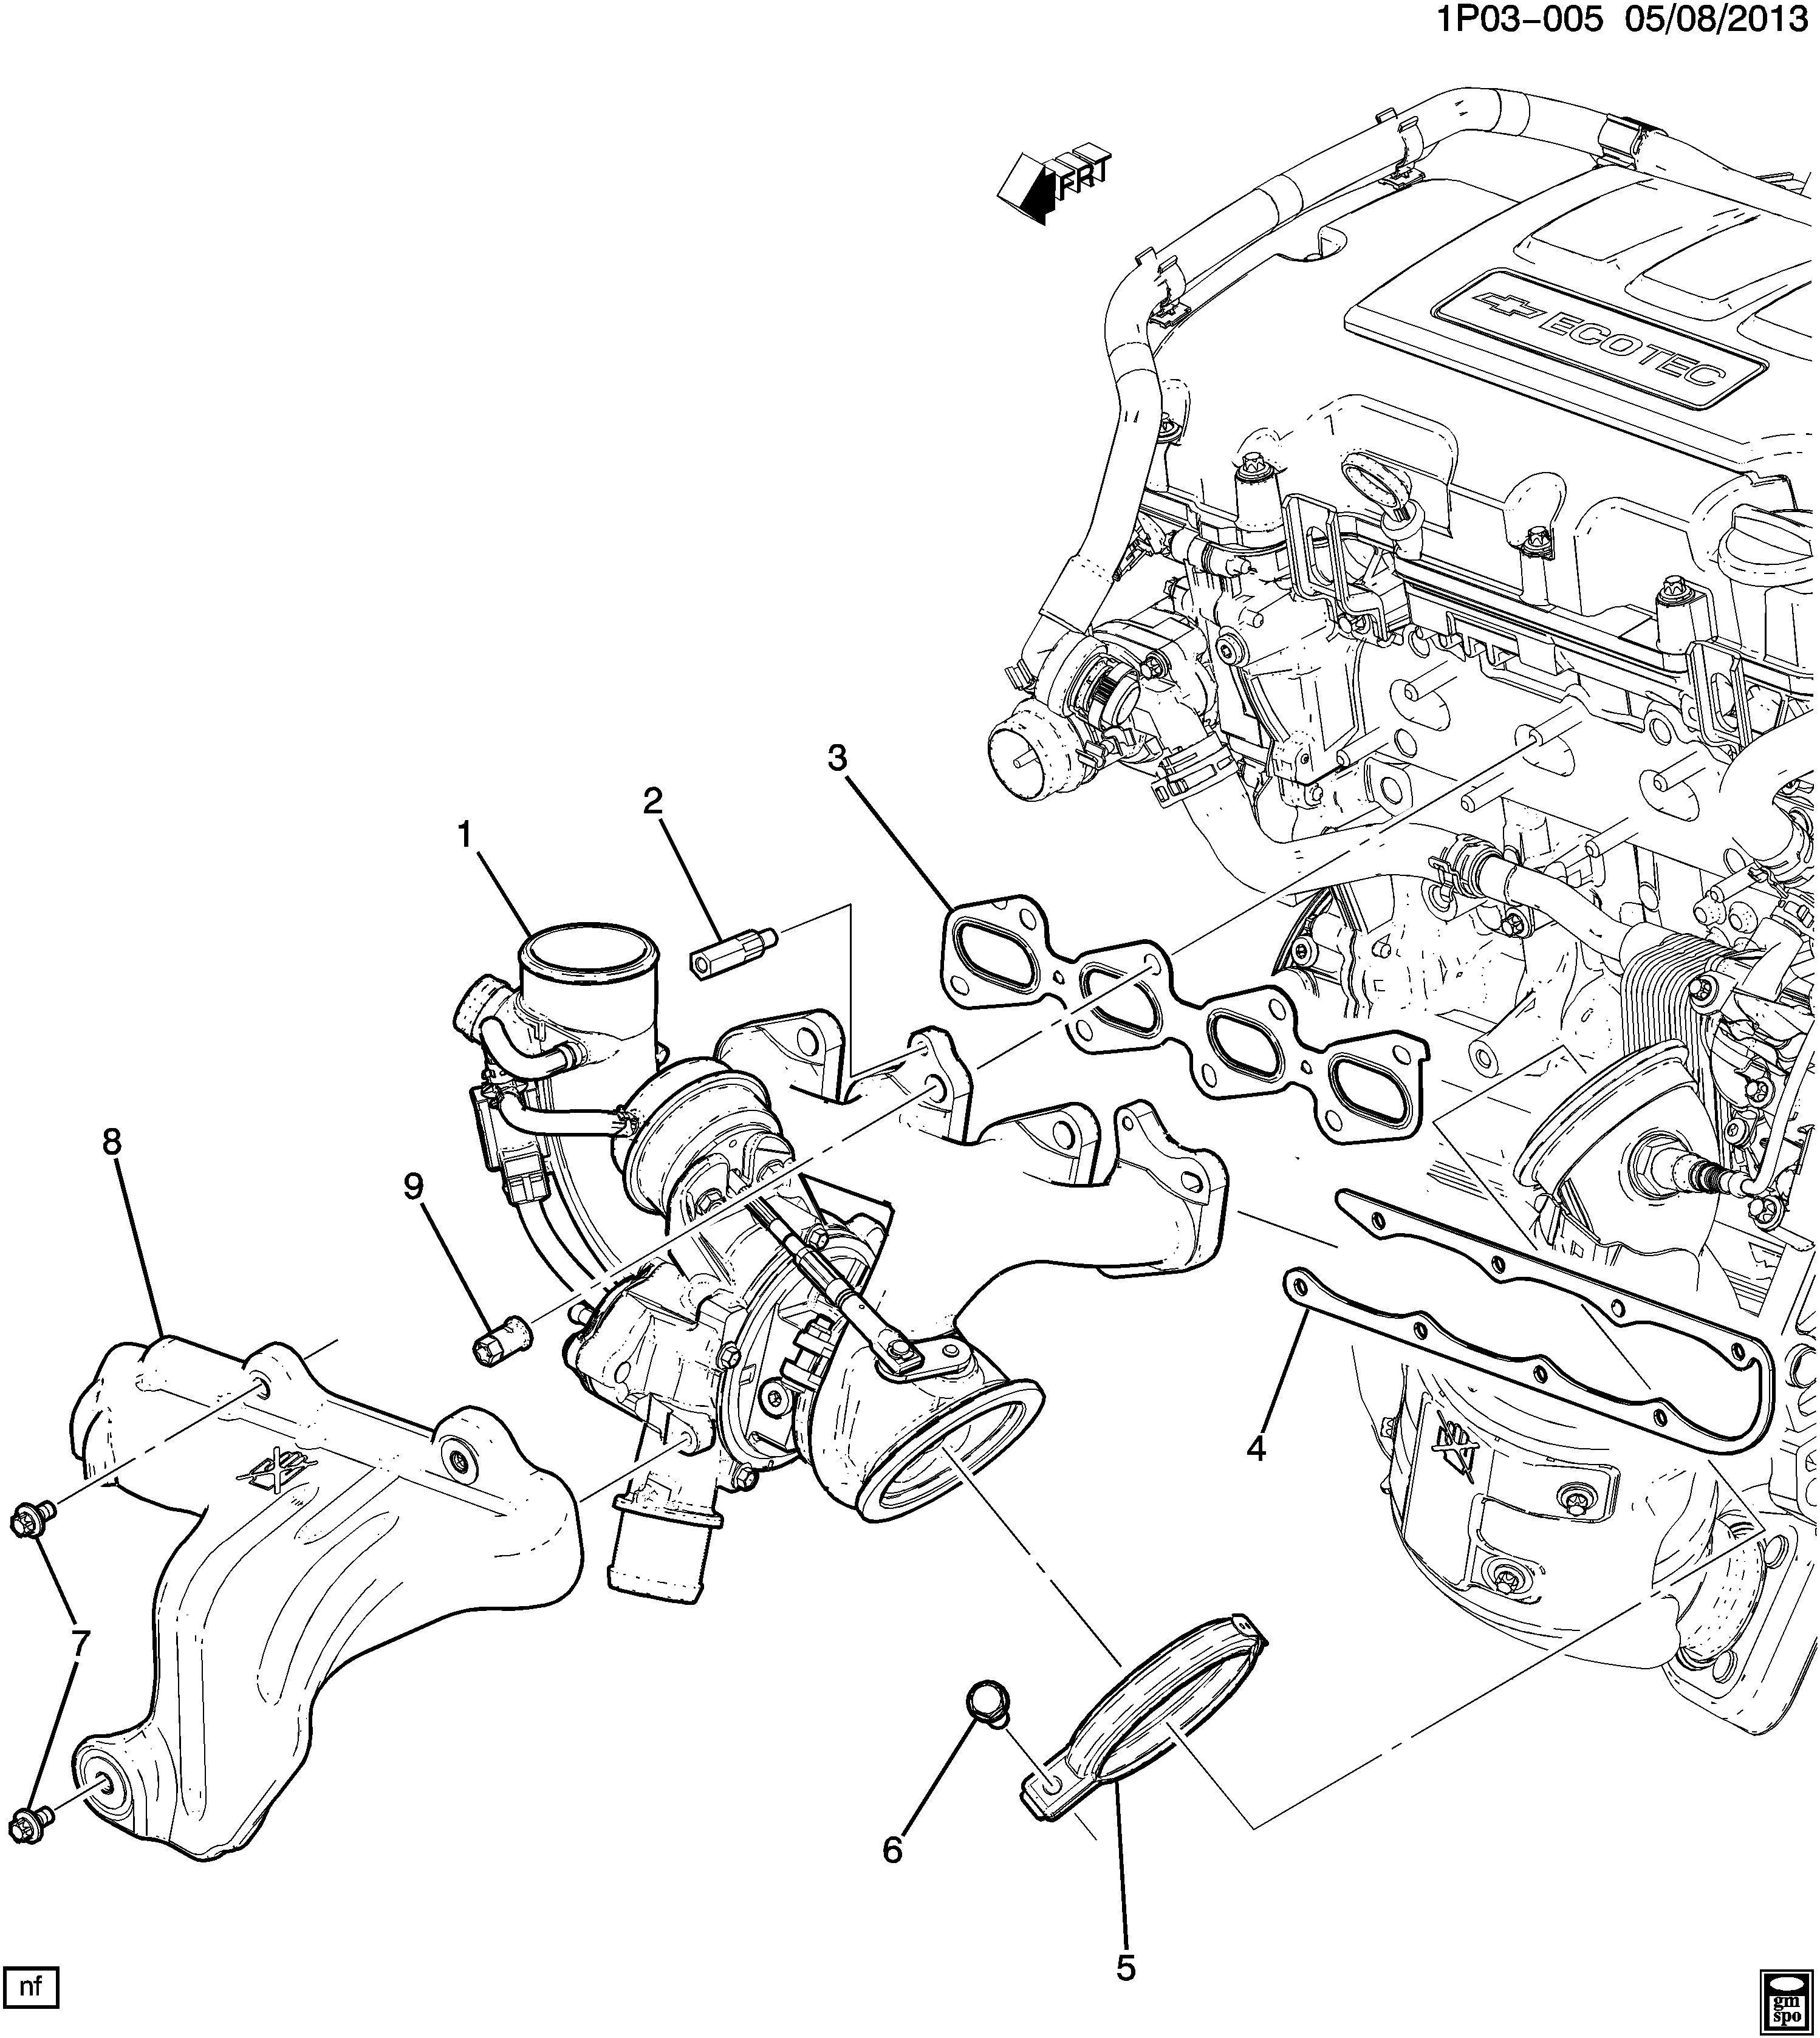 2014 Chevrolet Cruze Nut. Exhaust manifold bolt. Nut, exh ...